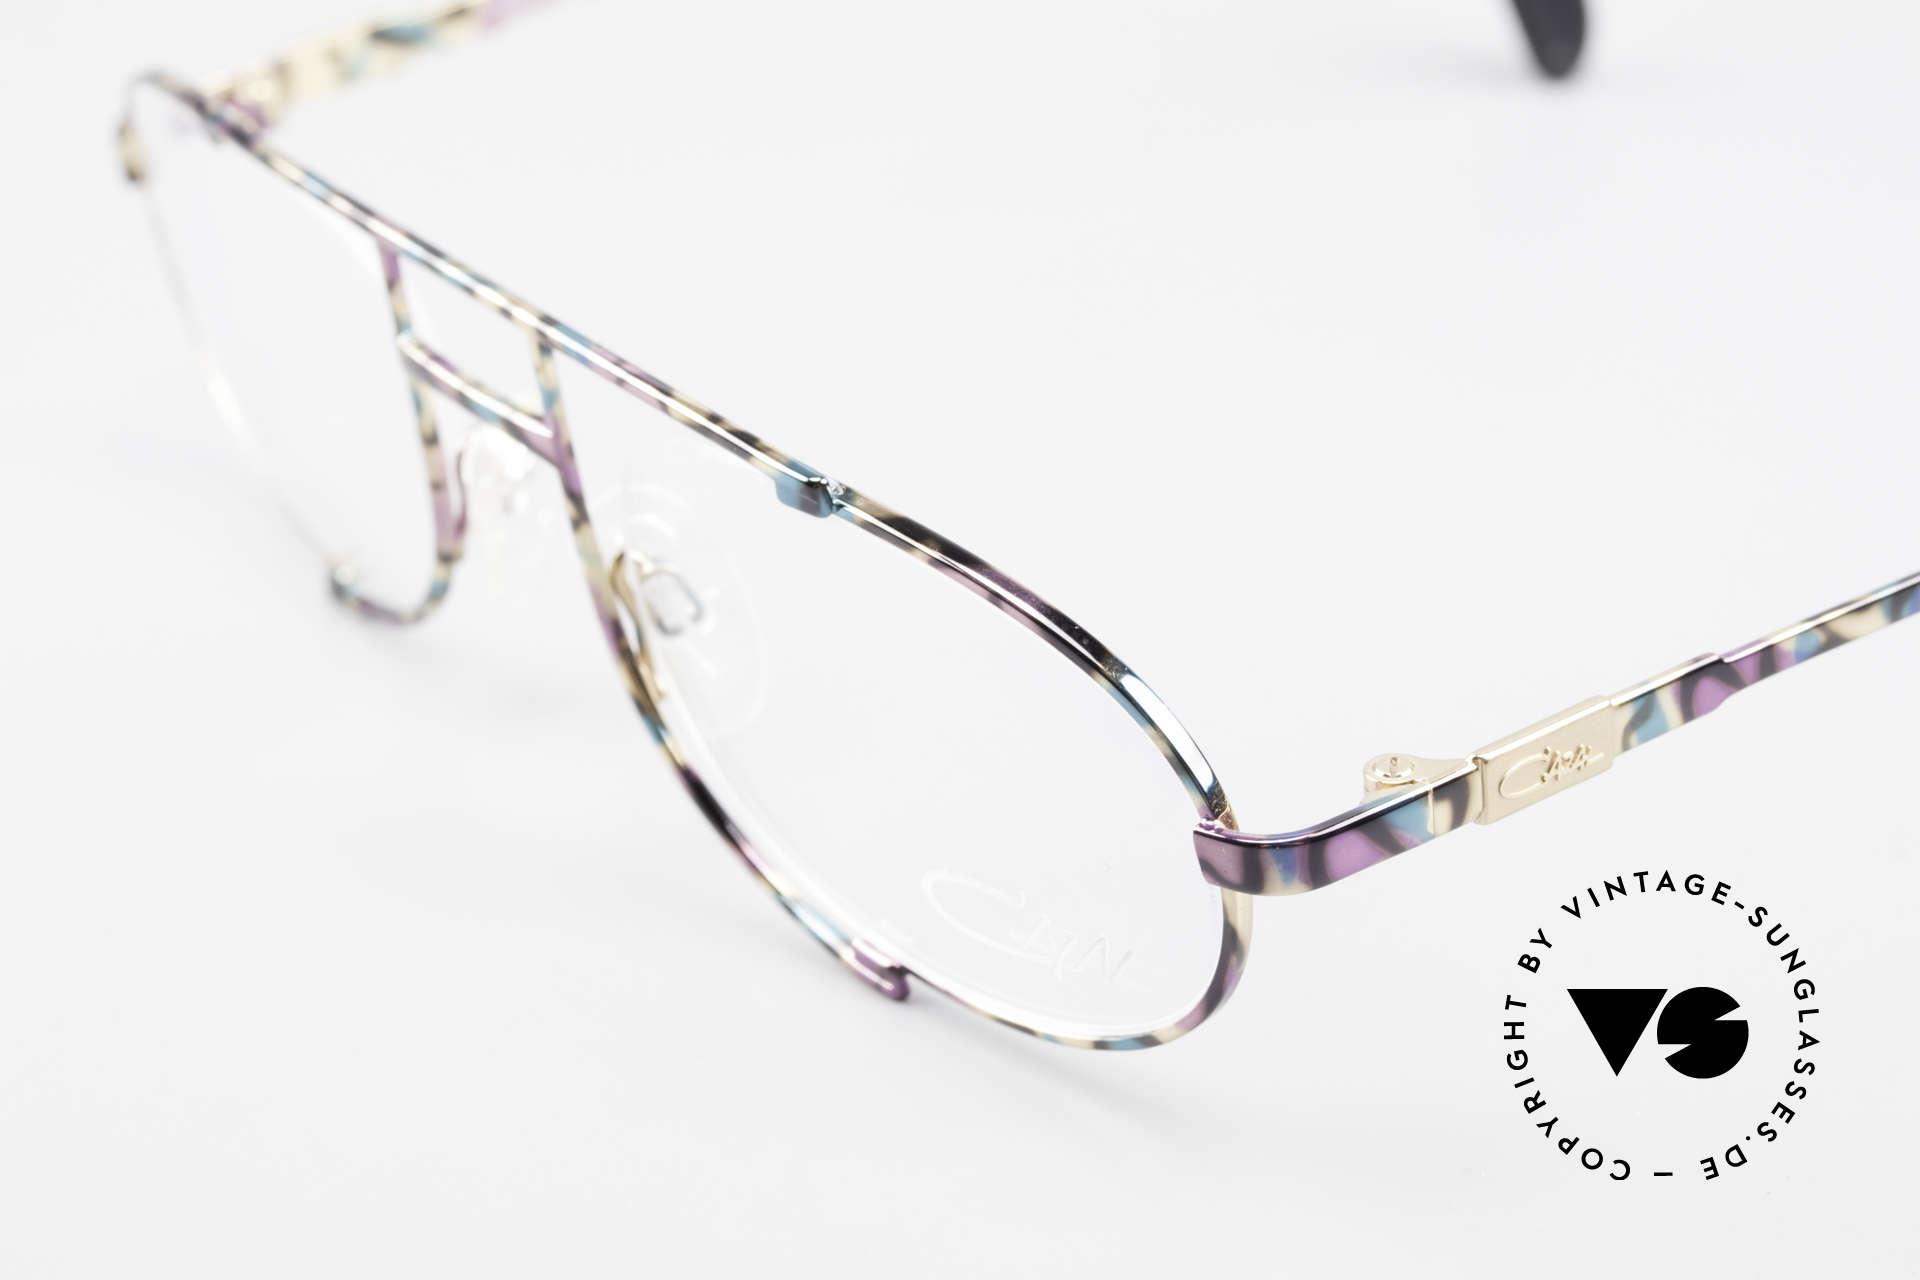 Cazal 753 Rare 90's Designer Eyeglasses, high-grade craftsmanship: frame made in Germany, Made for Men